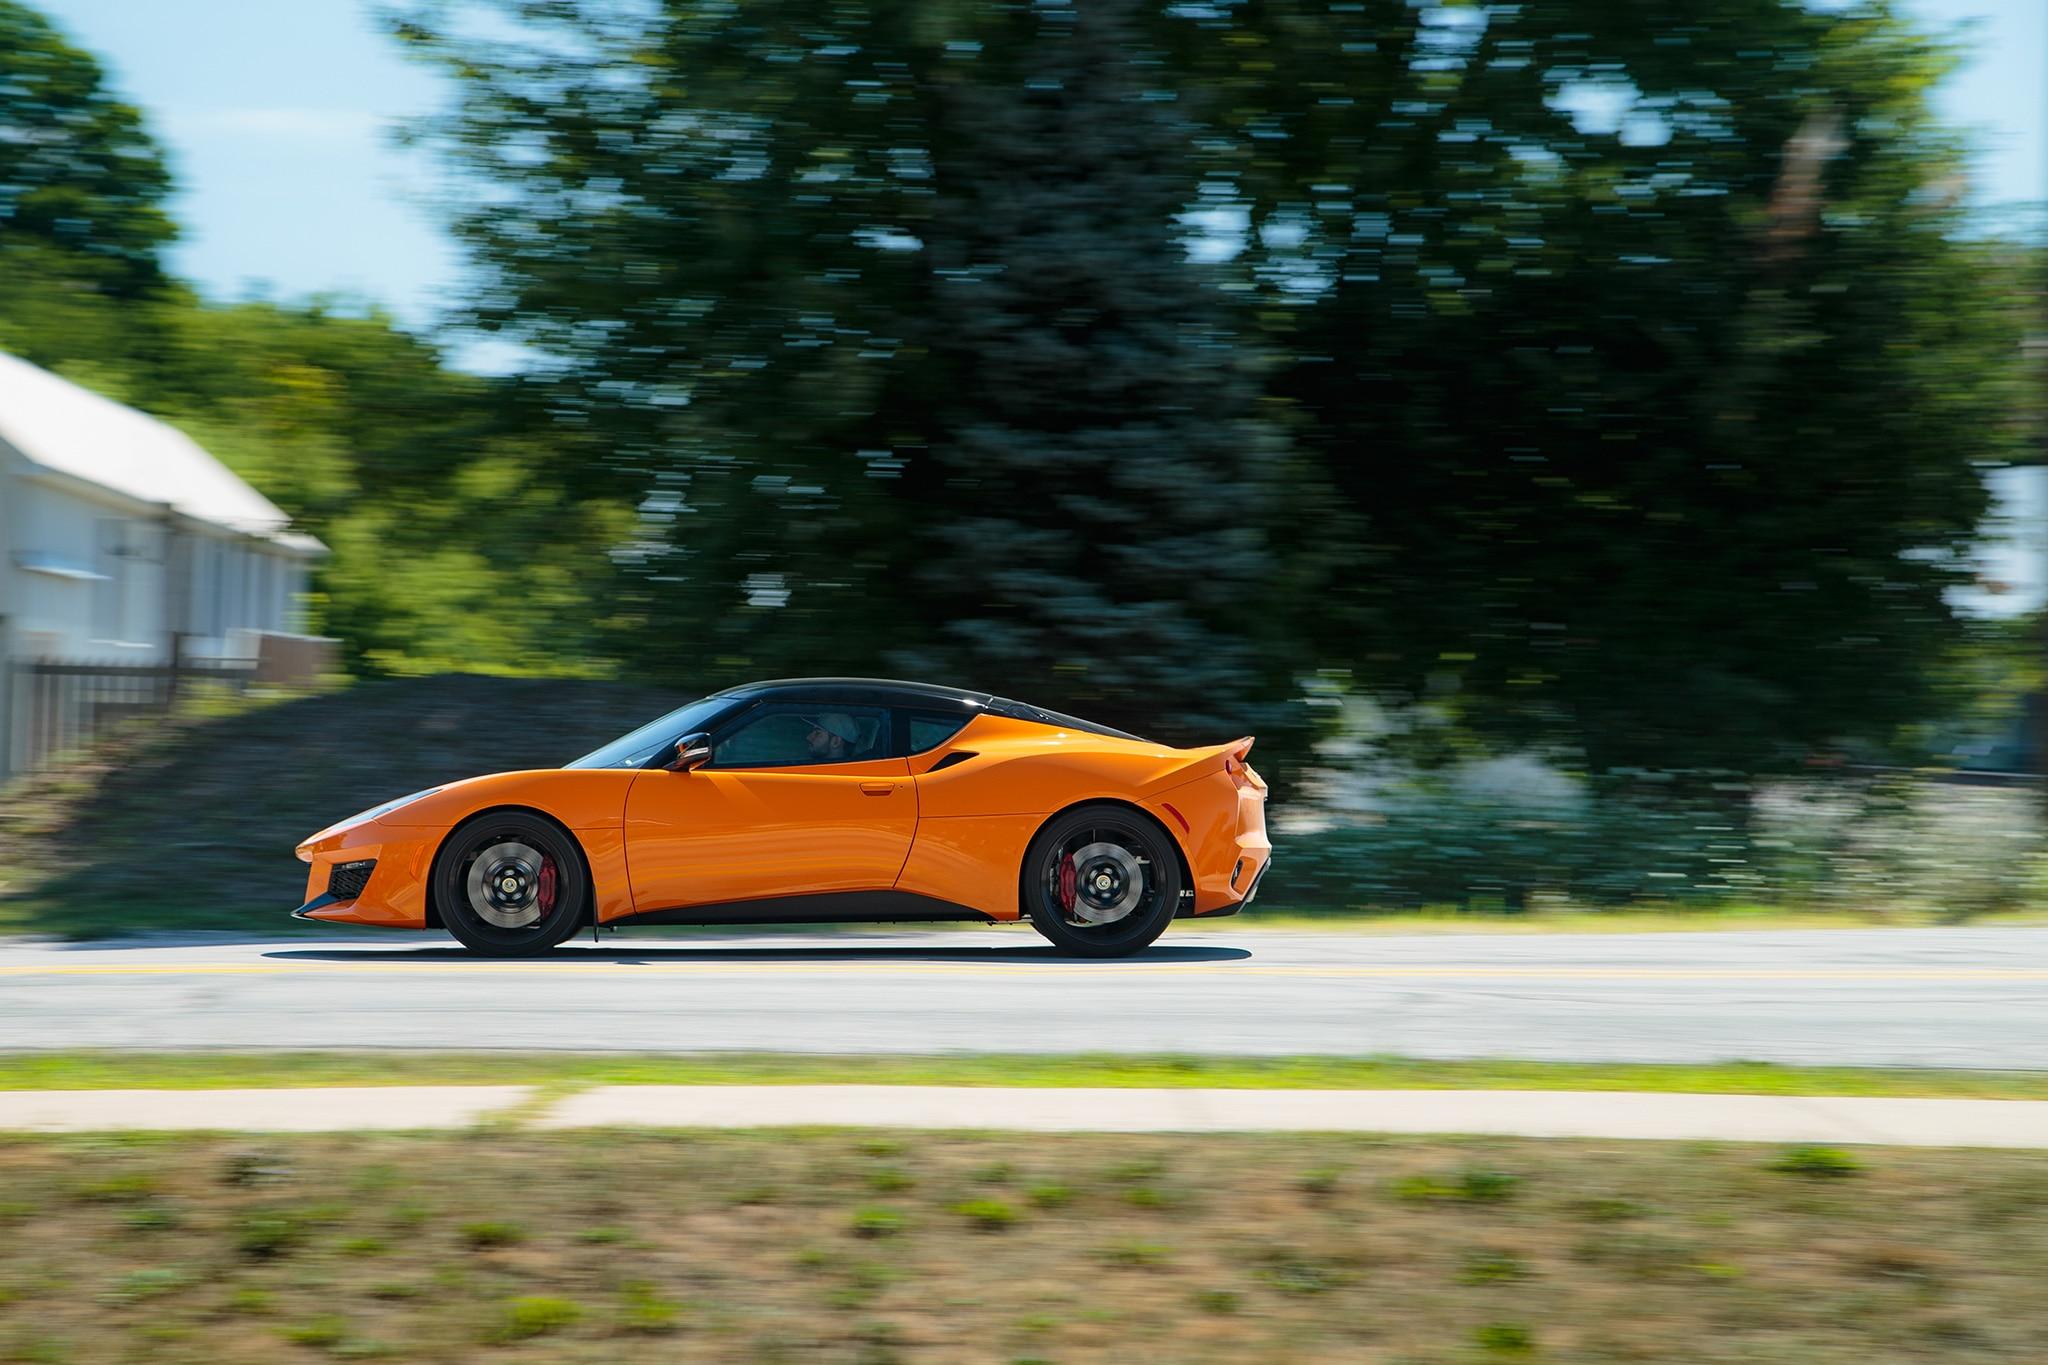 2017 Lotus Evora 400 Side Profile In Motion 03